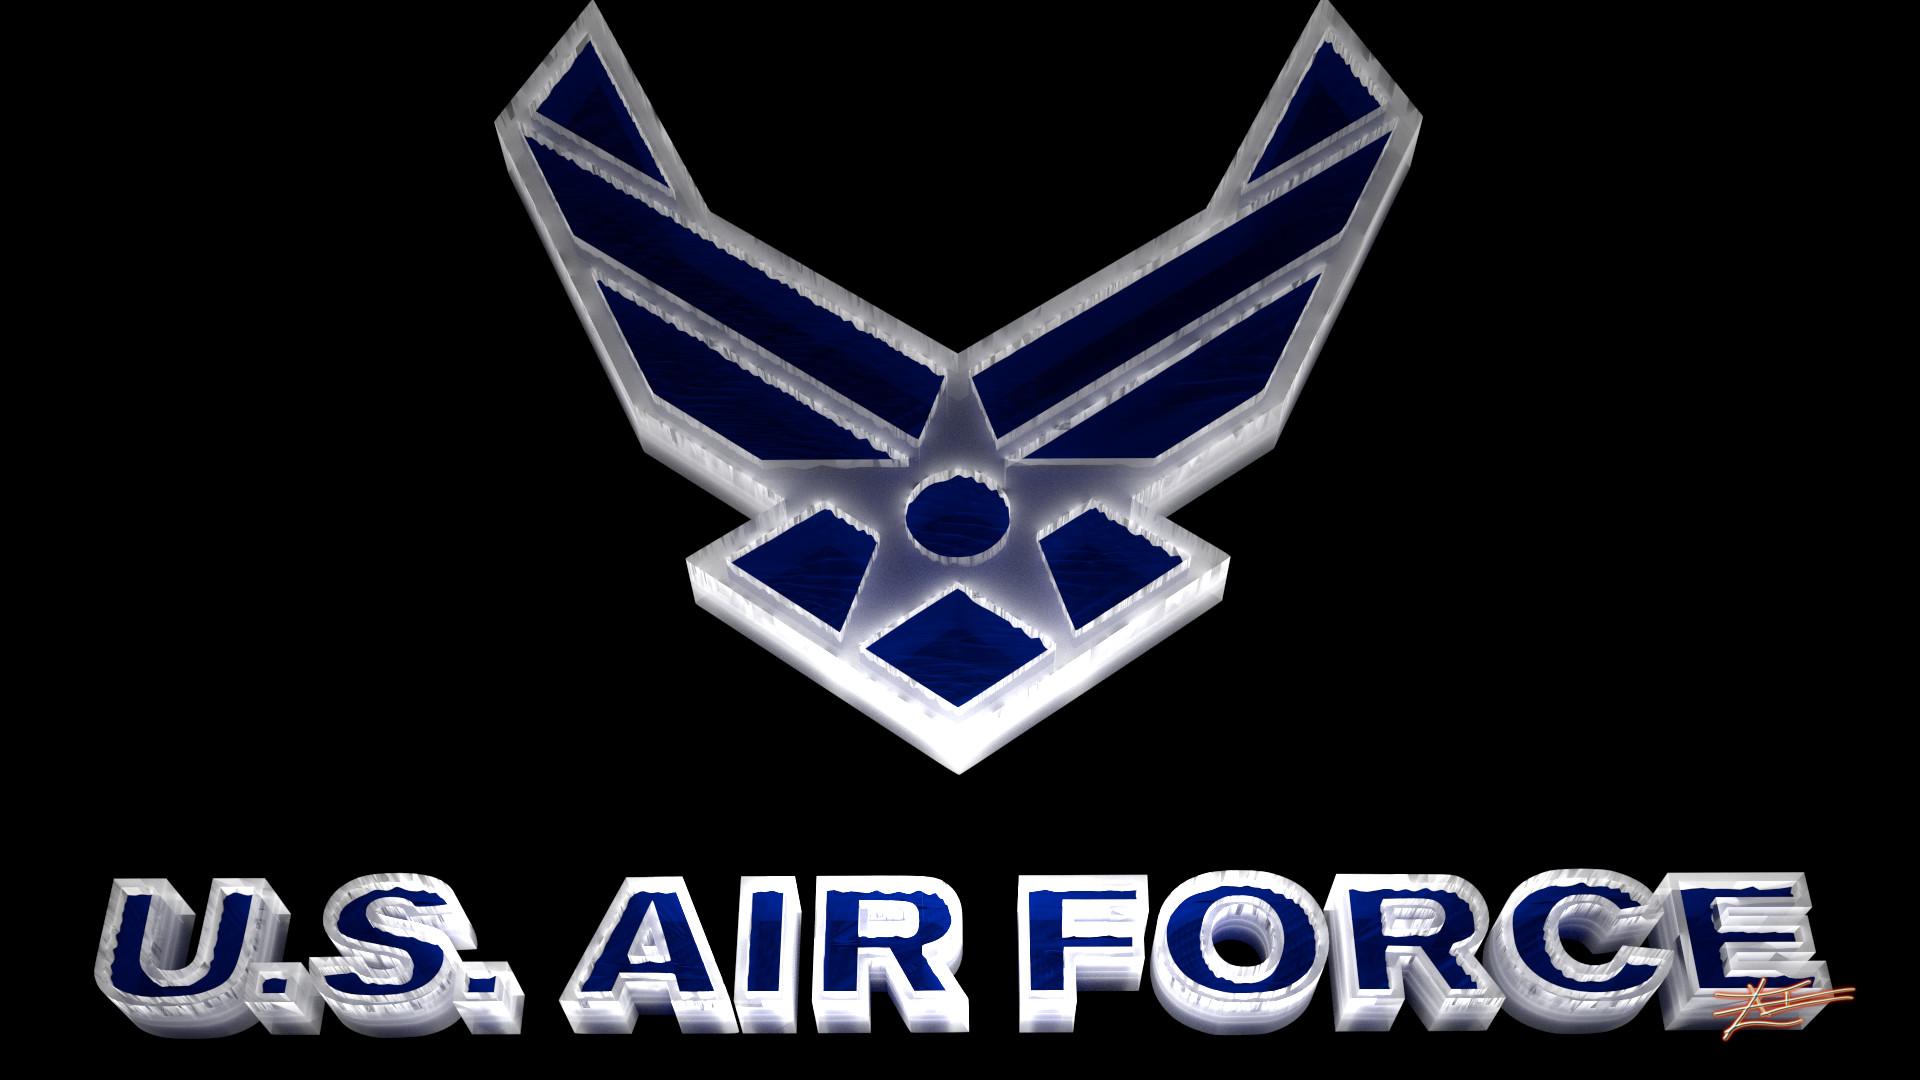 0 Air Force Logo Wallpaper Air Force Logo Wallpaper